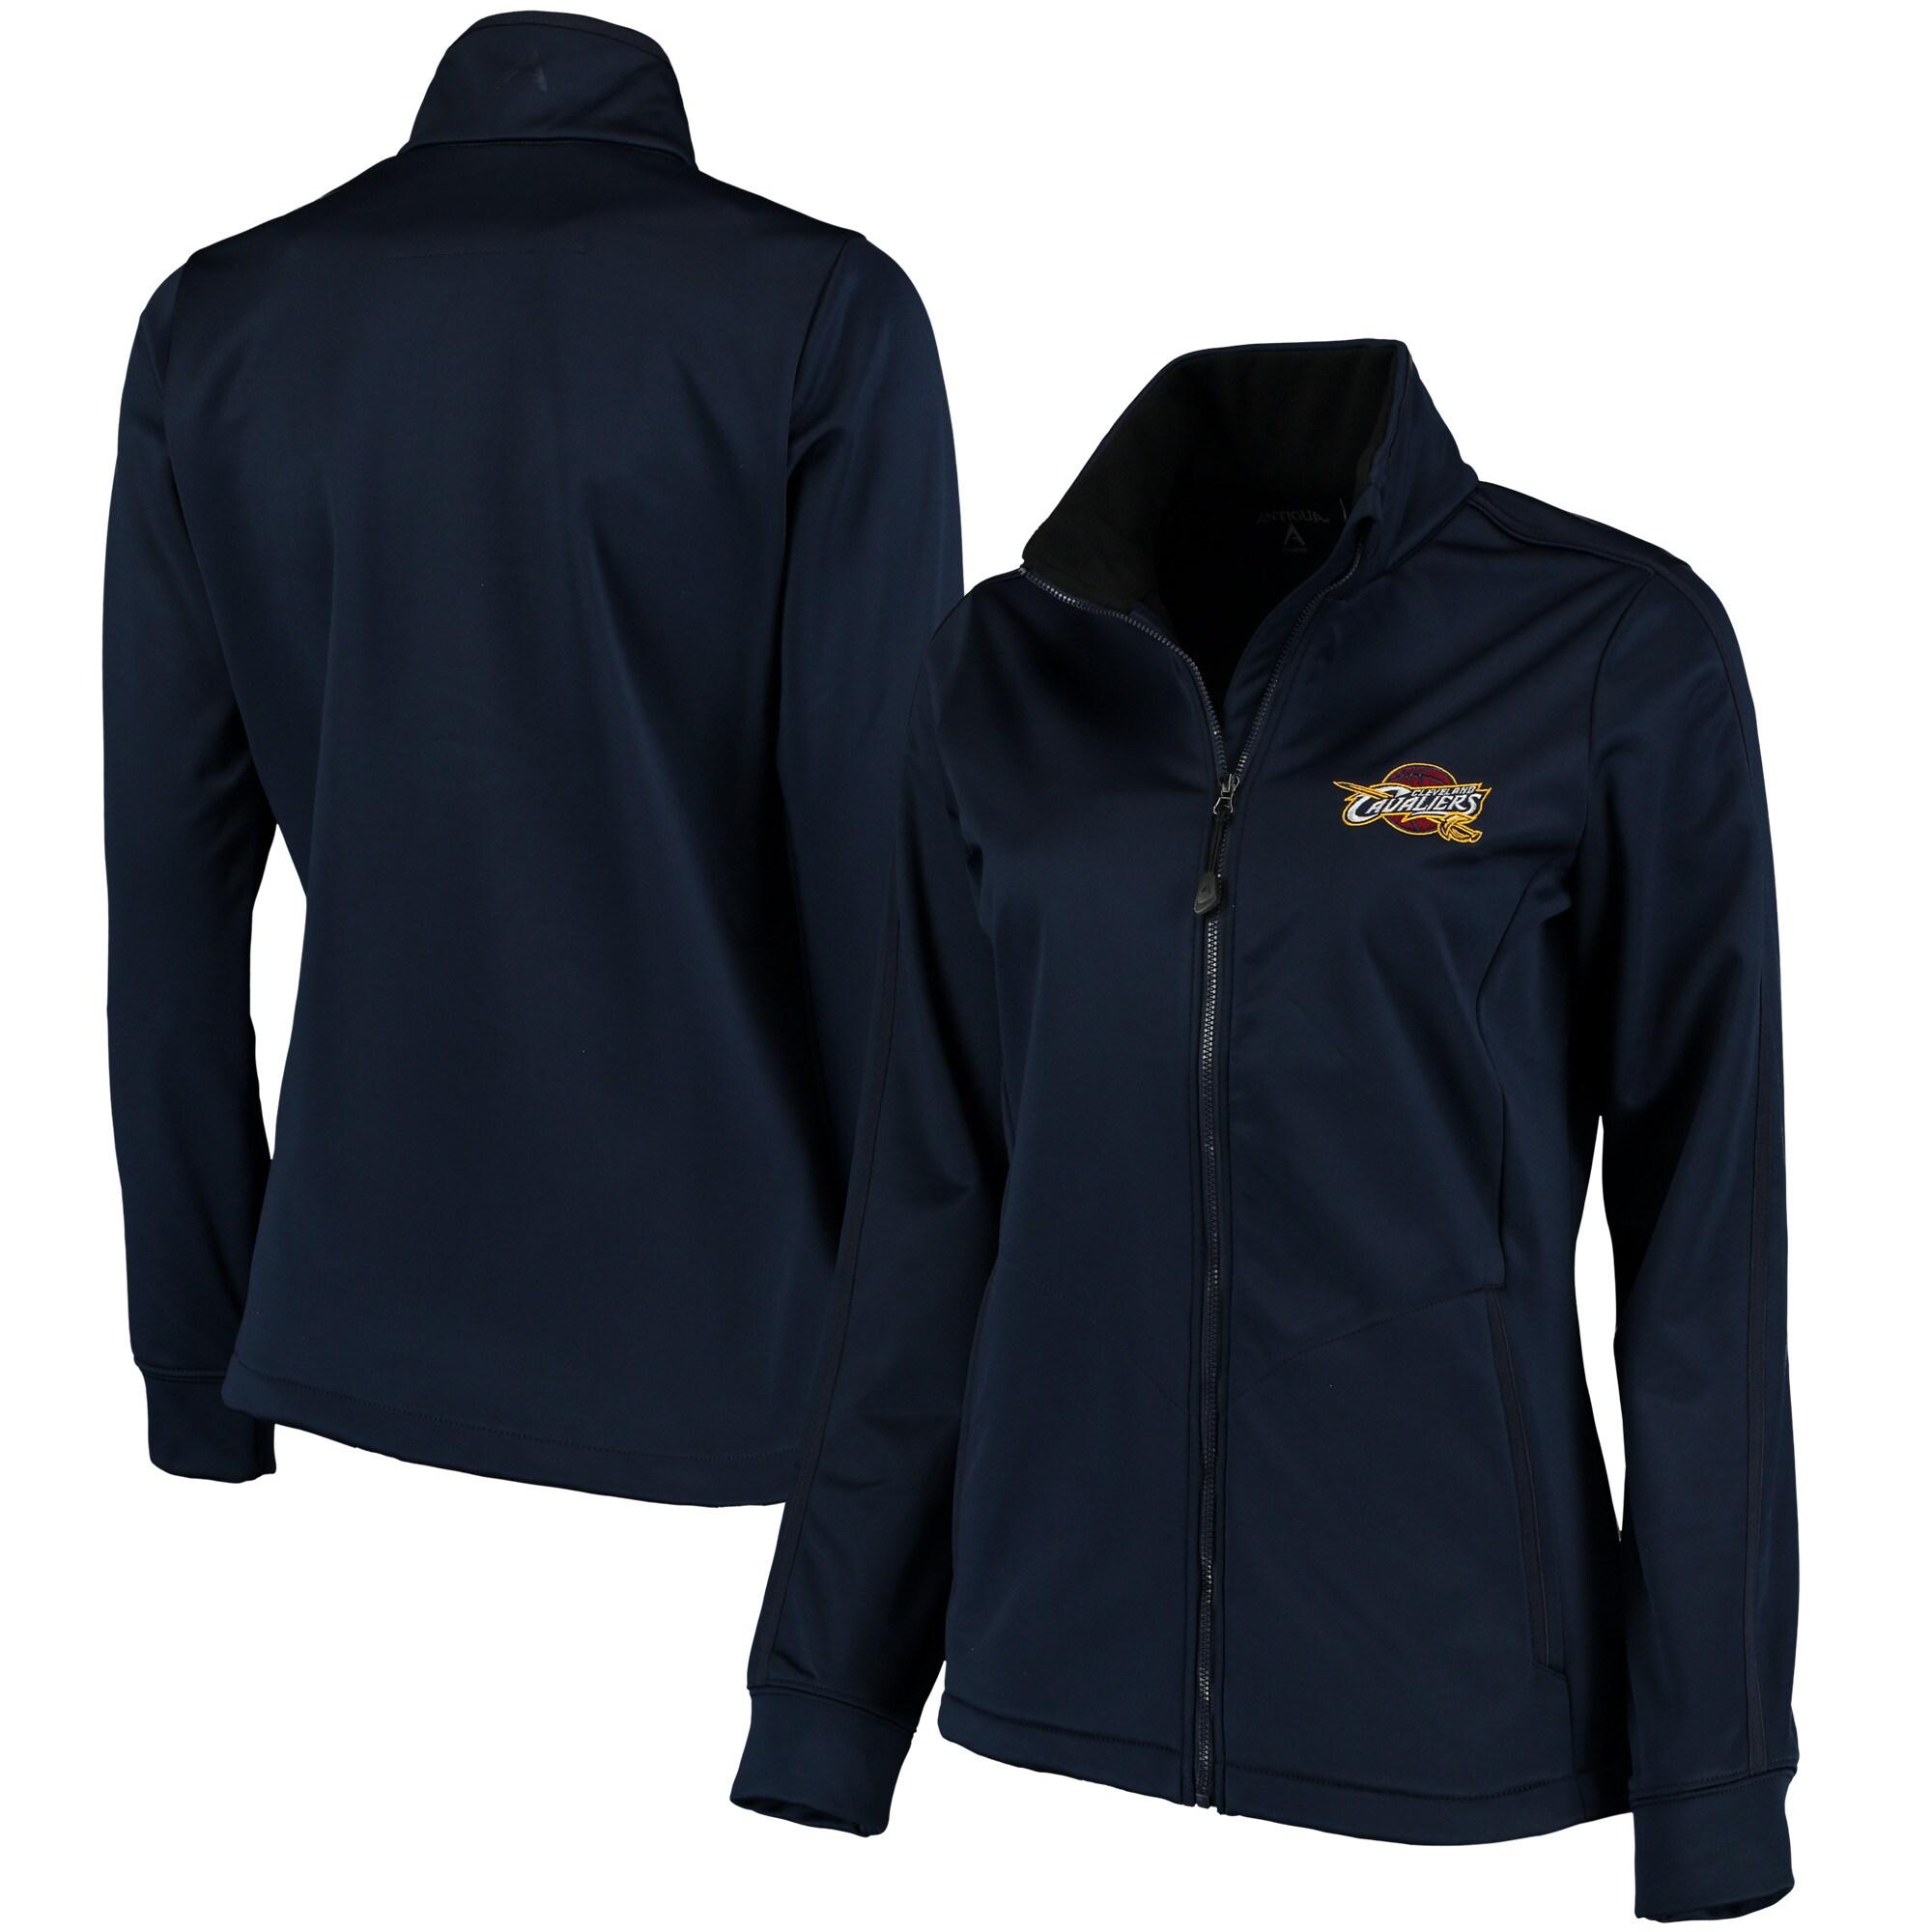 Cleveland Cavaliers Antigua Women's Golf Full-Zip Jacket - Heathered Navy